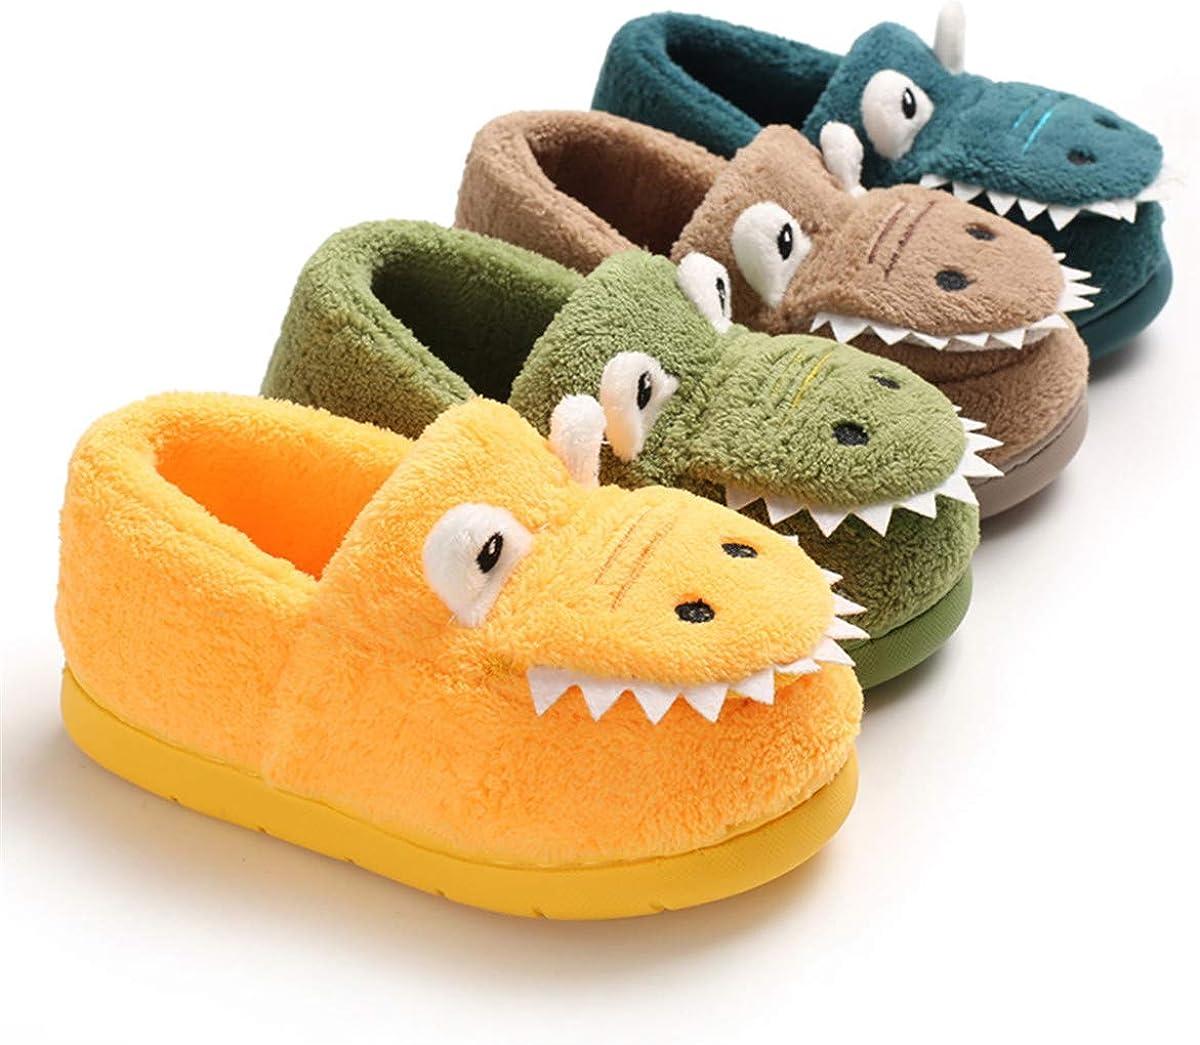 BENHERO Toddler Kids Boys Girls House Slippers Cartoon Dinosaur Winter Warm Indoor Bedroom Shoes